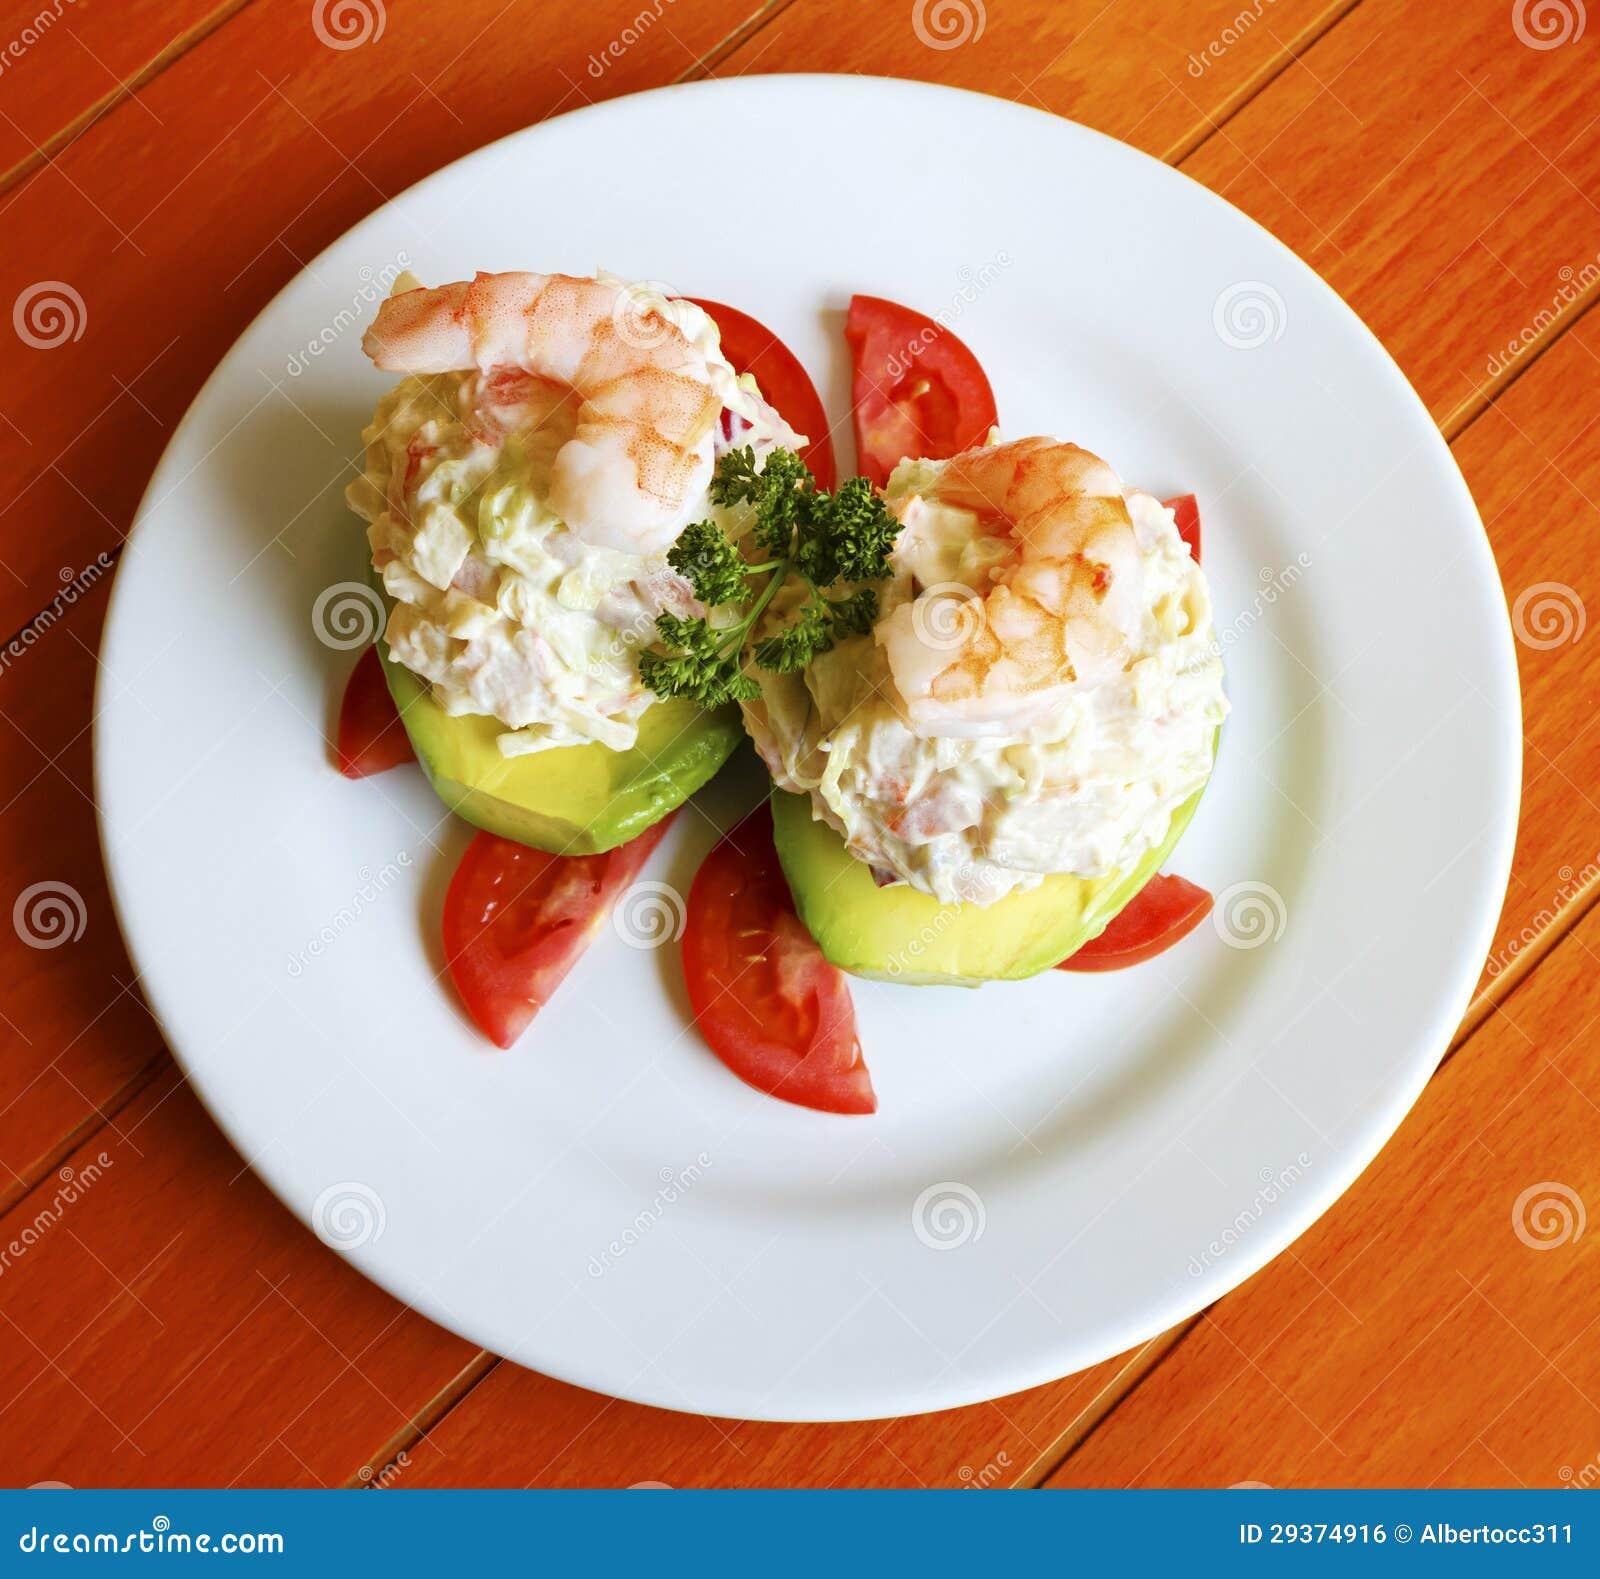 Seafood Stuffed Avocado Royalty Free Stock Image - Image ...